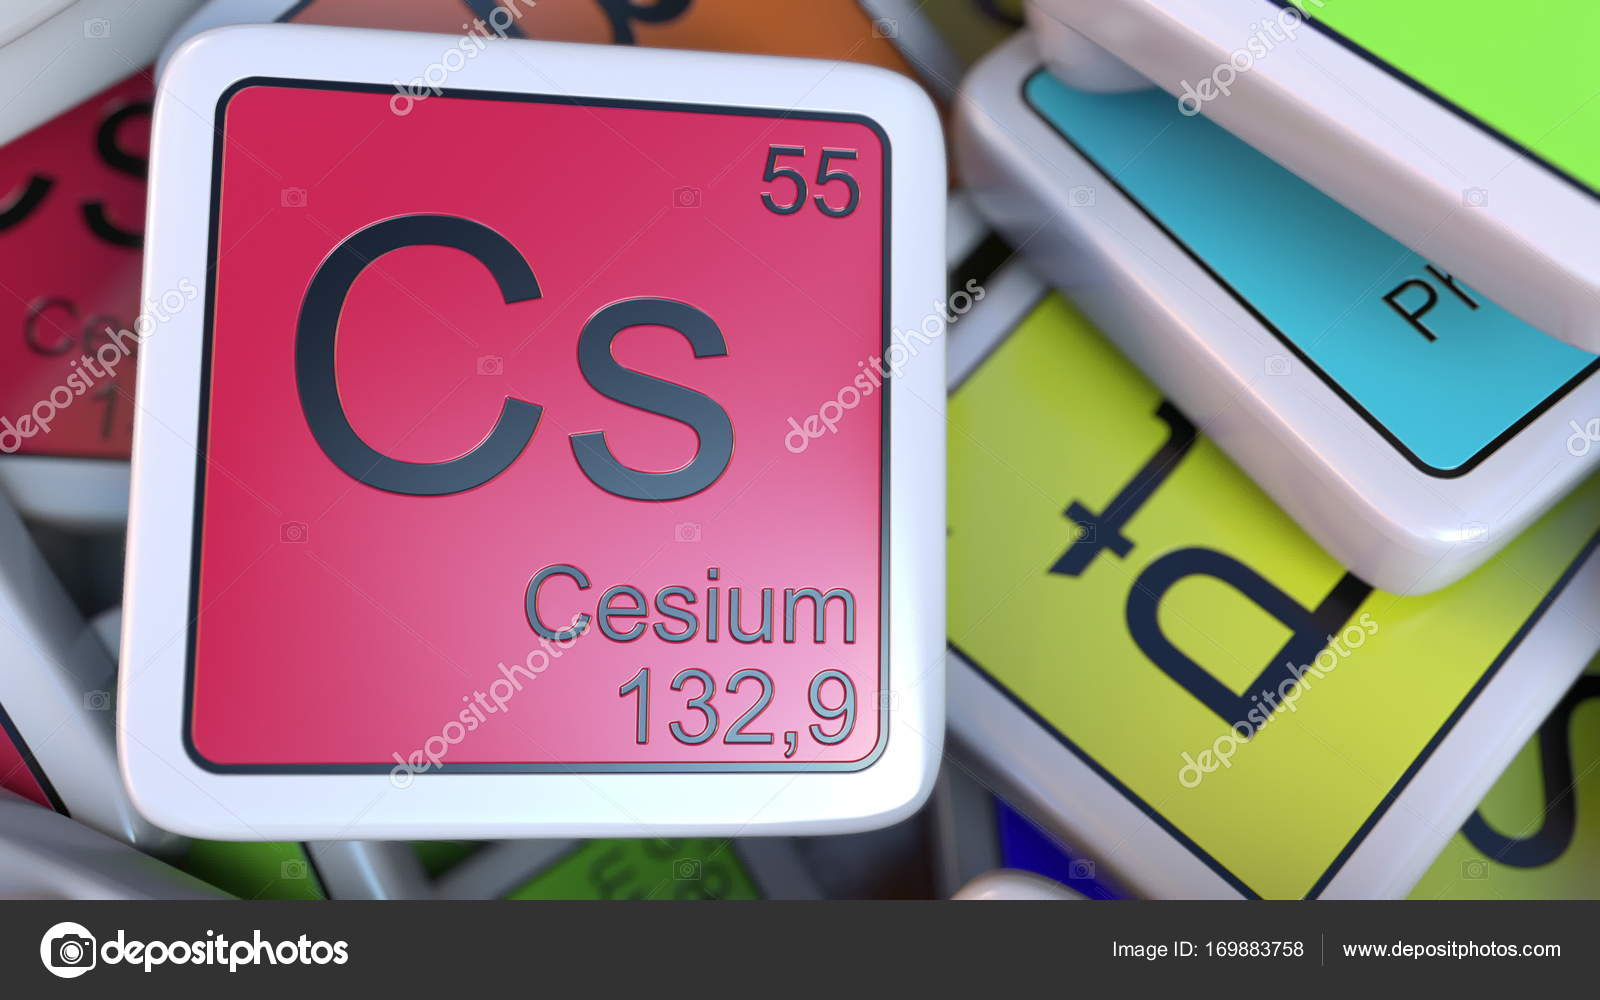 Cesio cs bloque la pila de la tabla peridica de los bloques de cesio cs bloque la pila de la tabla peridica de los bloques de elementos qumicos urtaz Gallery